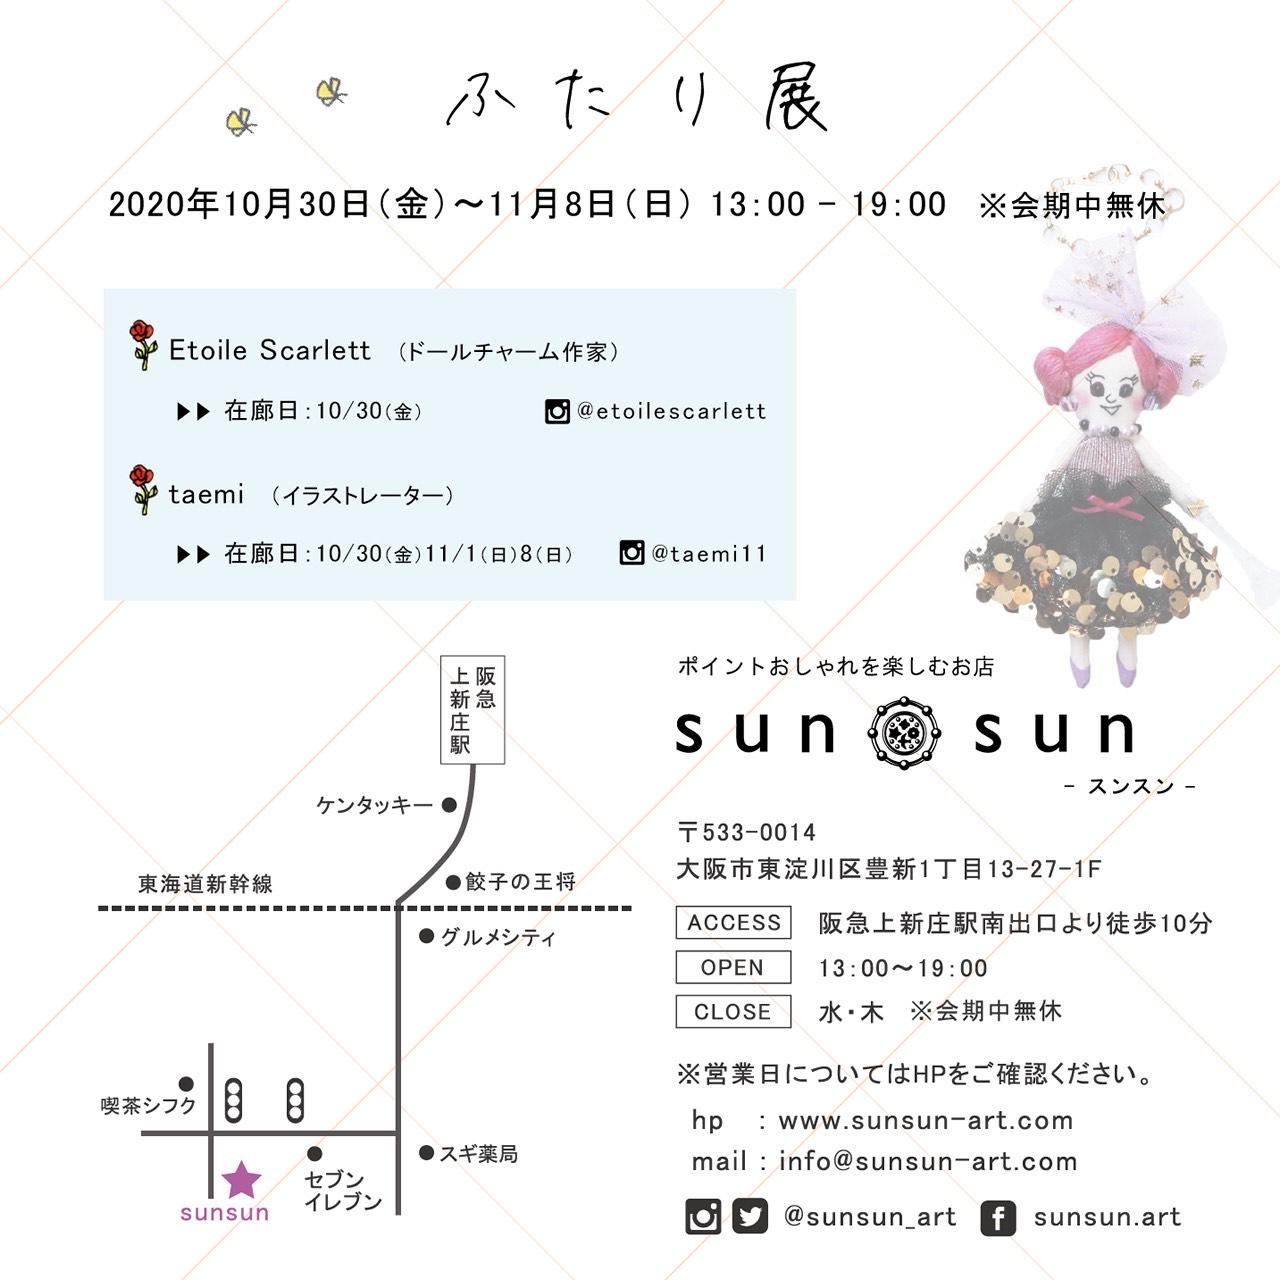 Etoile Scarlett × taemi「ふたり展」詳細